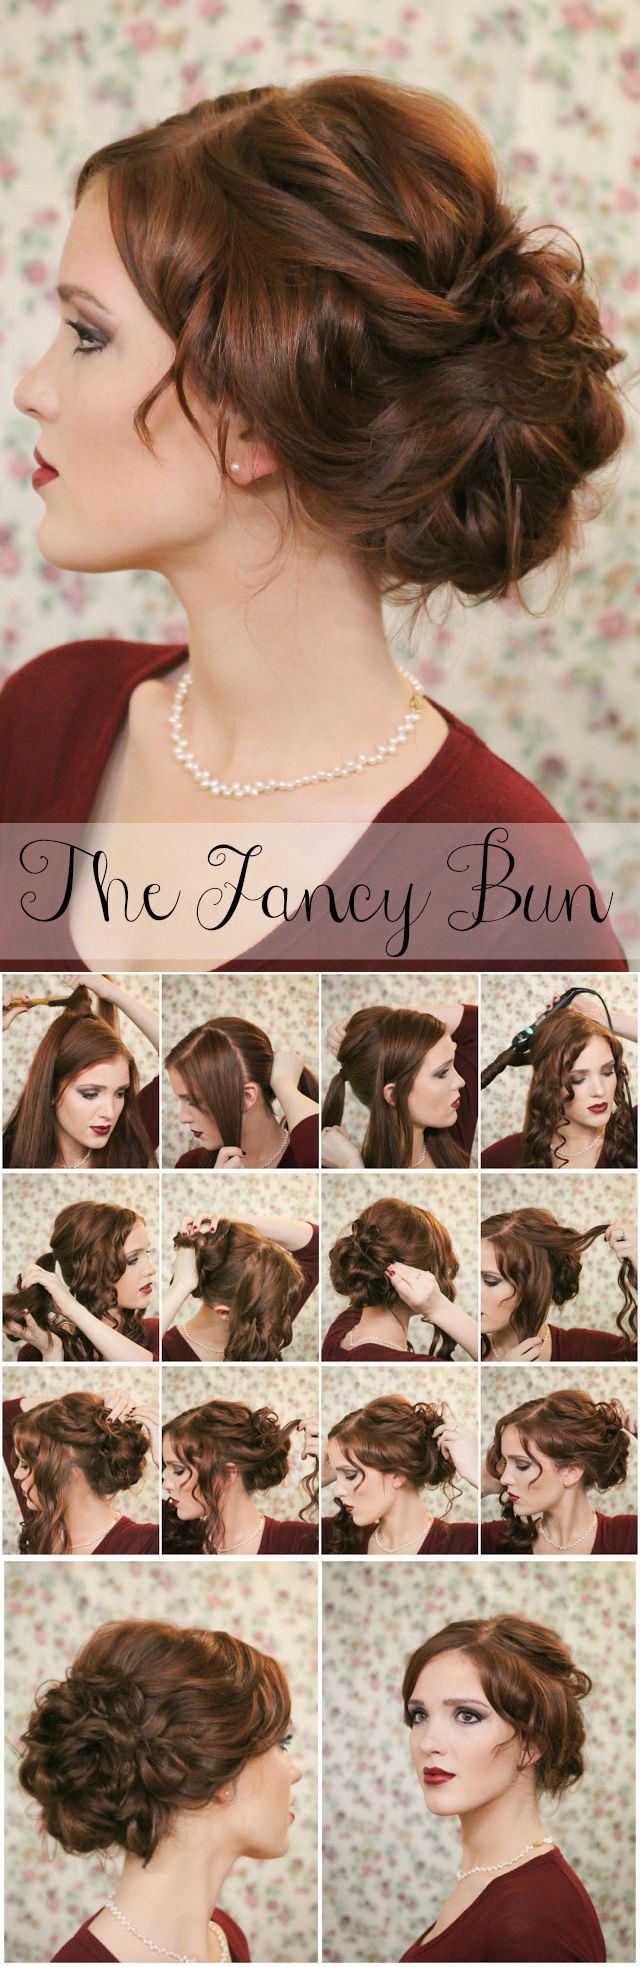 Admirable Top 25 Messy Hair Bun Tutorials Perfect For Those Lazy Mornings Short Hairstyles Gunalazisus